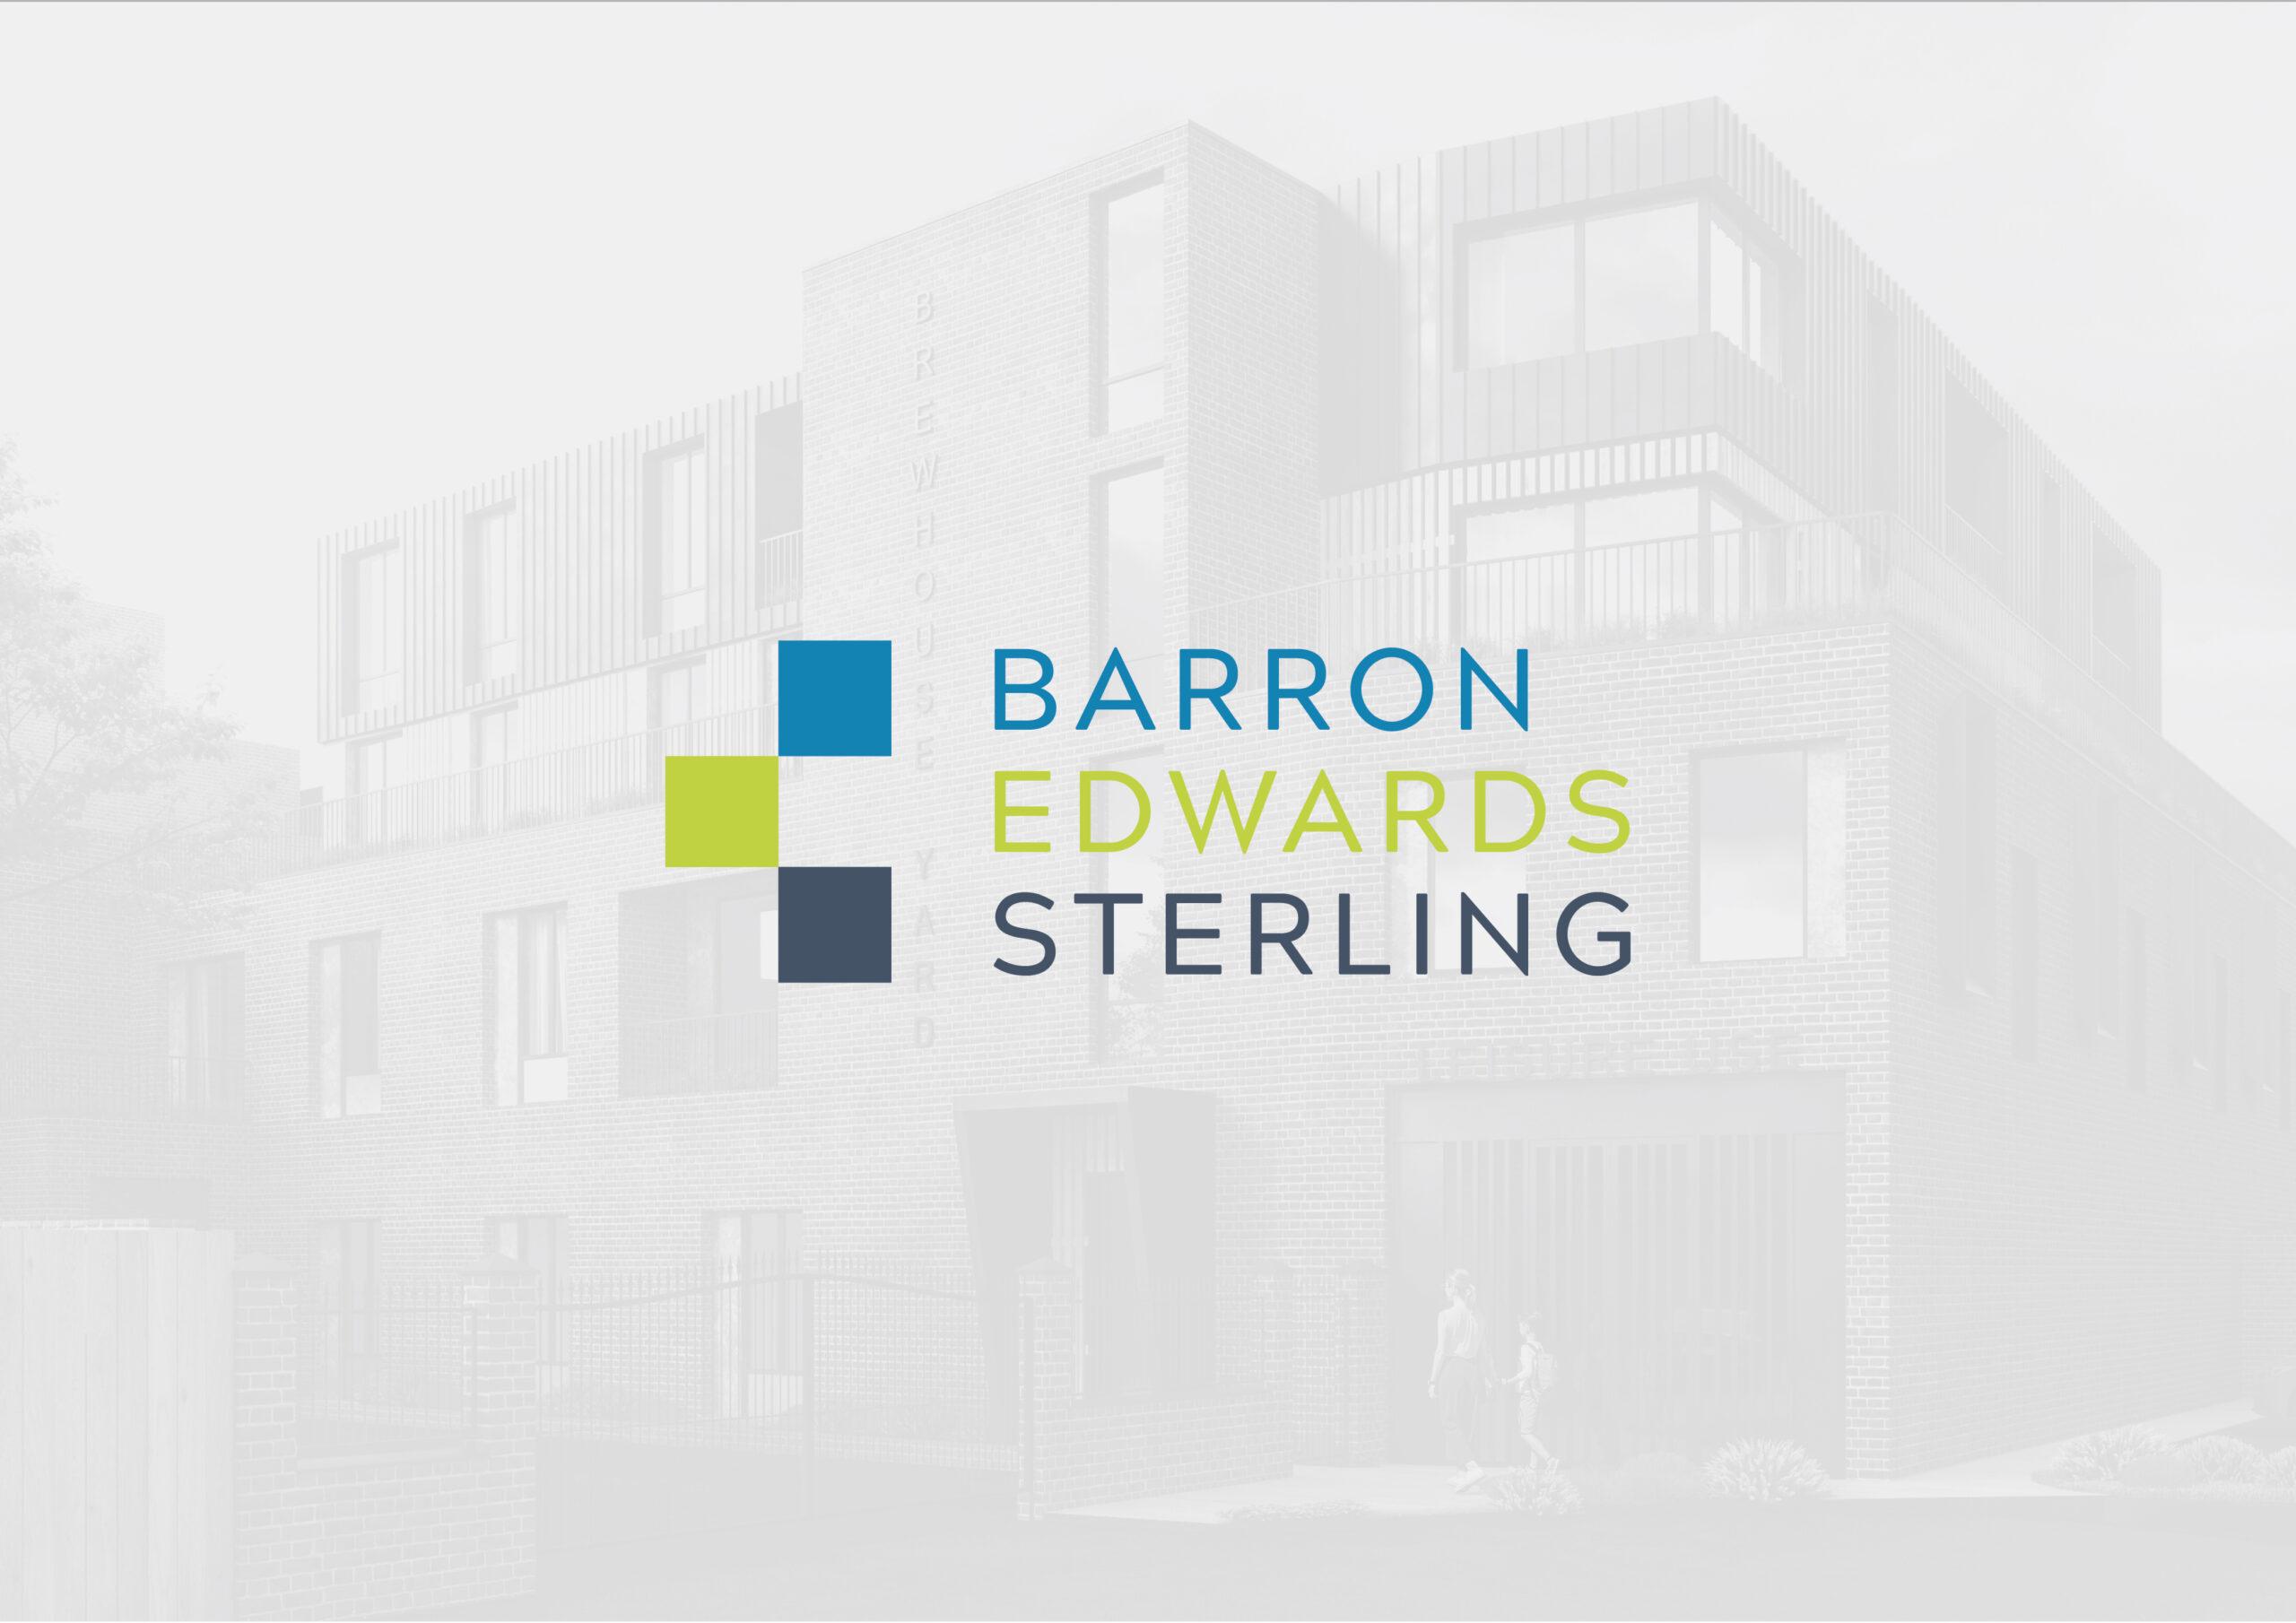 Barron edwards sterling thumbnail